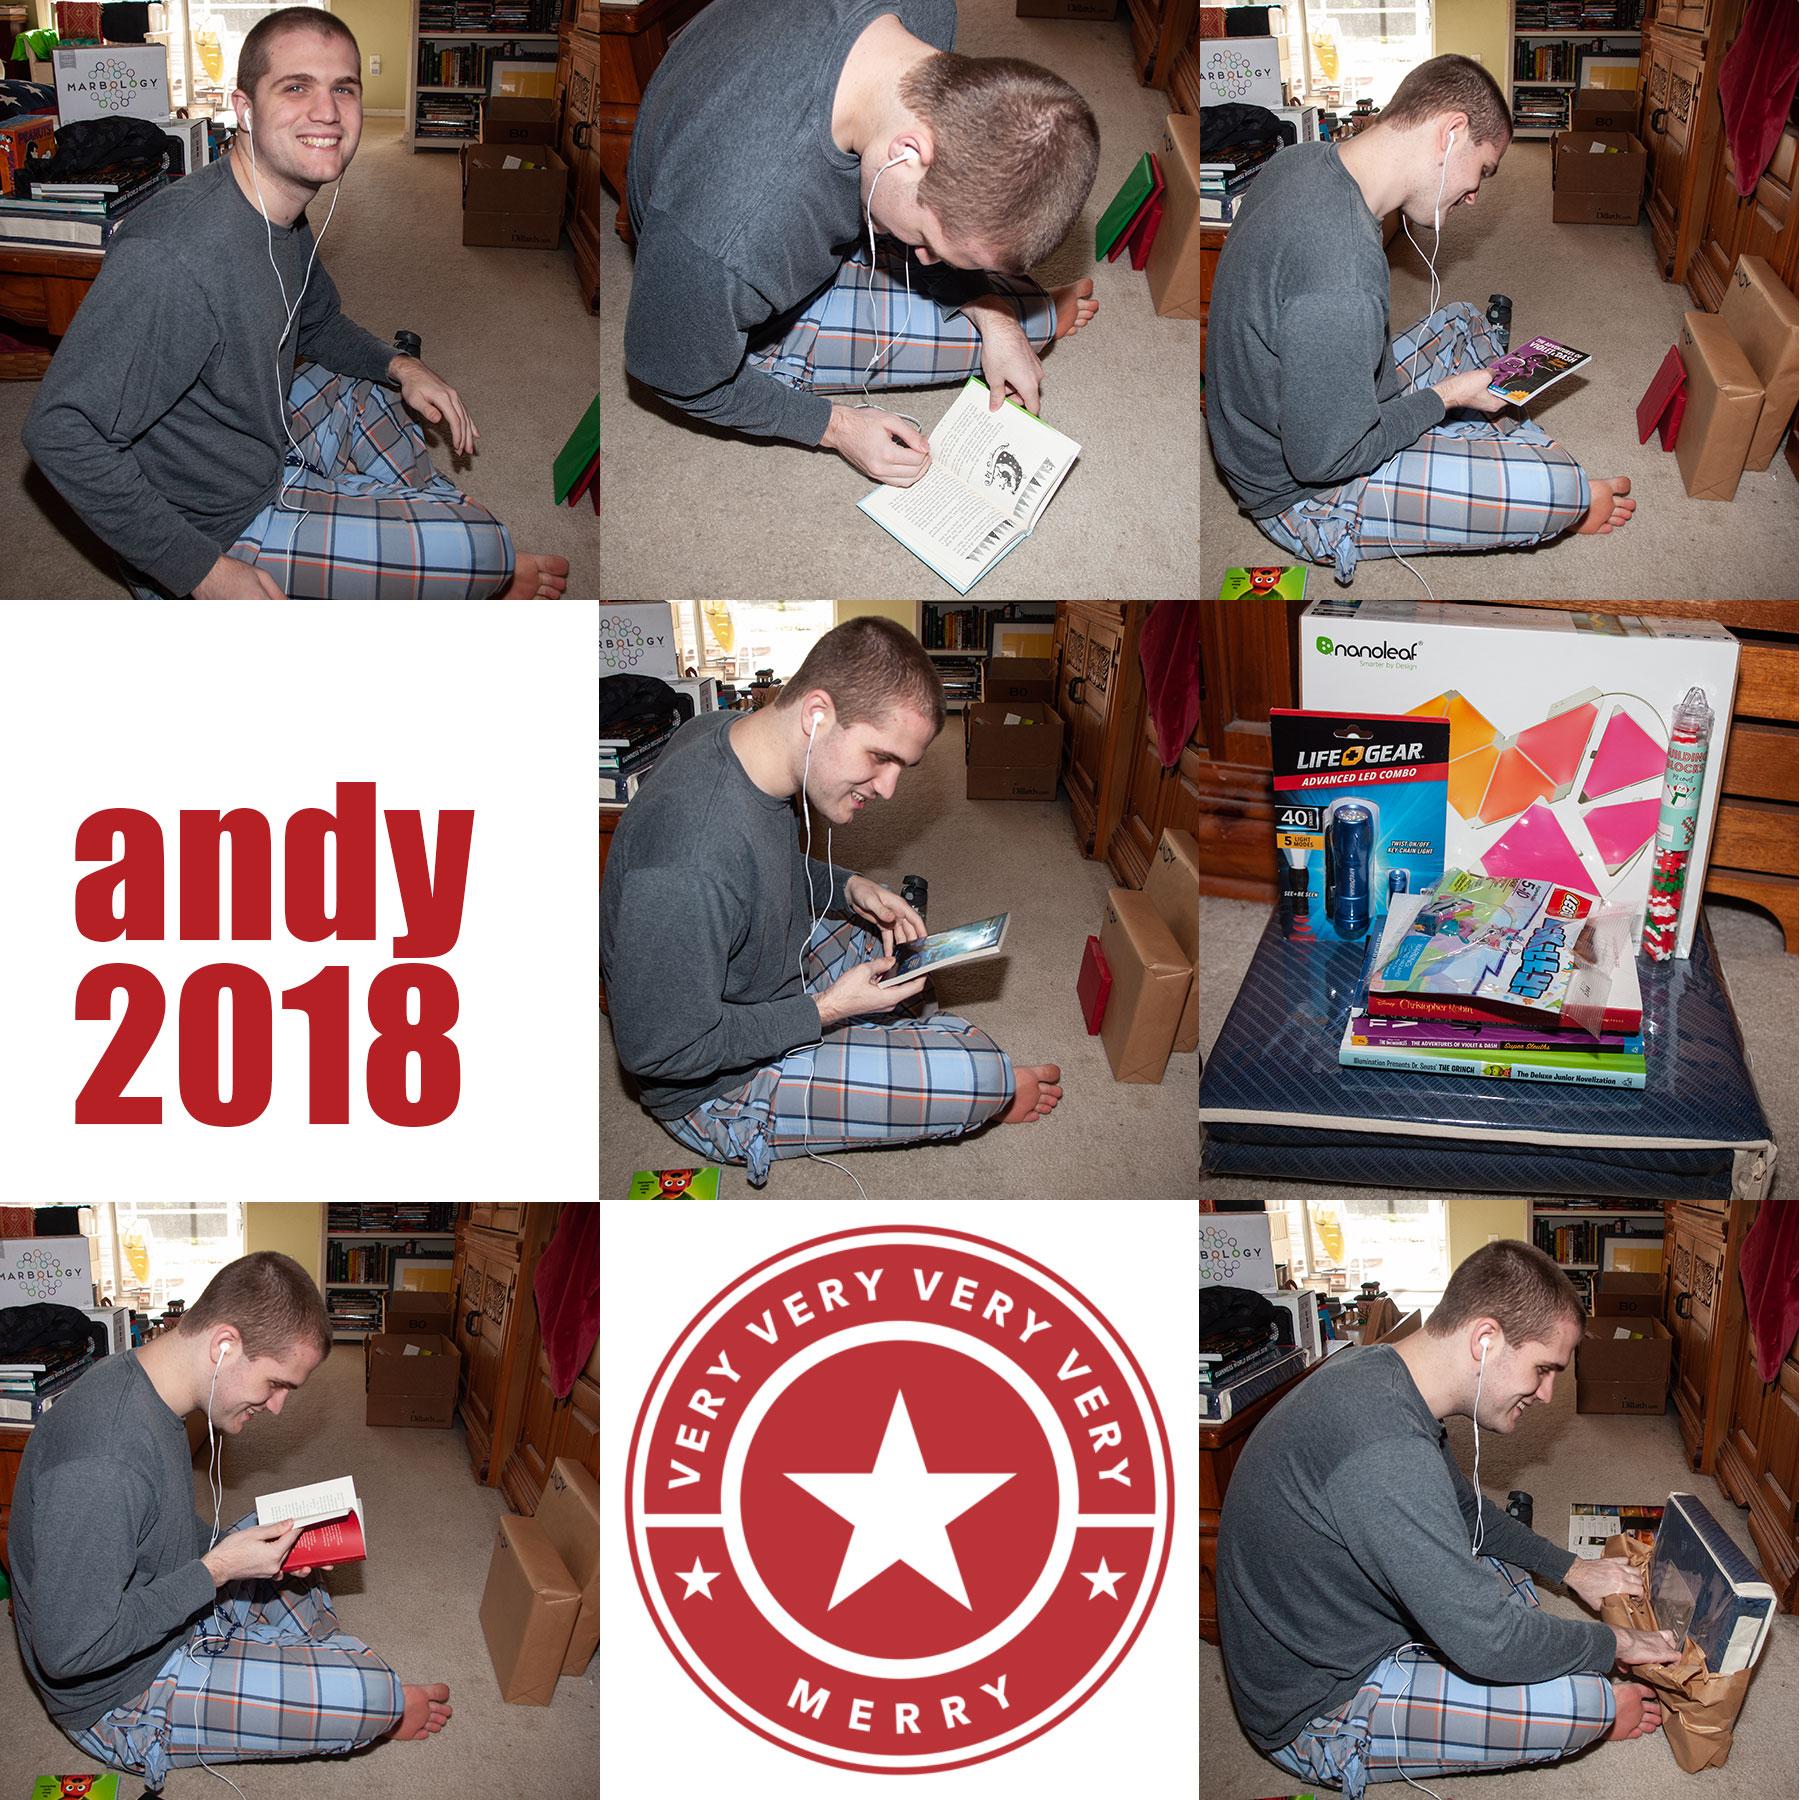 2018-andy.jpg